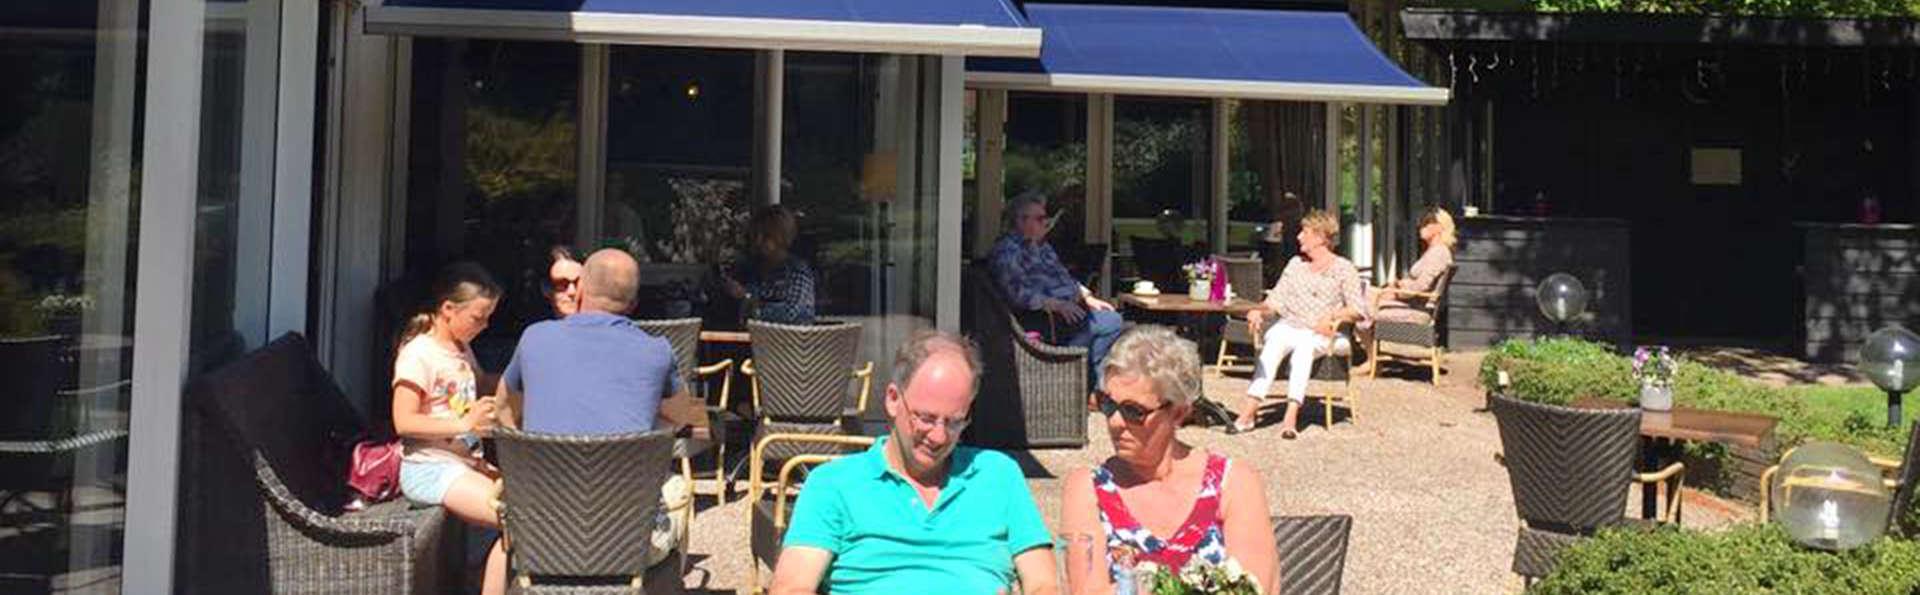 Veluwe Hotel Stakenberg - edit_terras.jpg